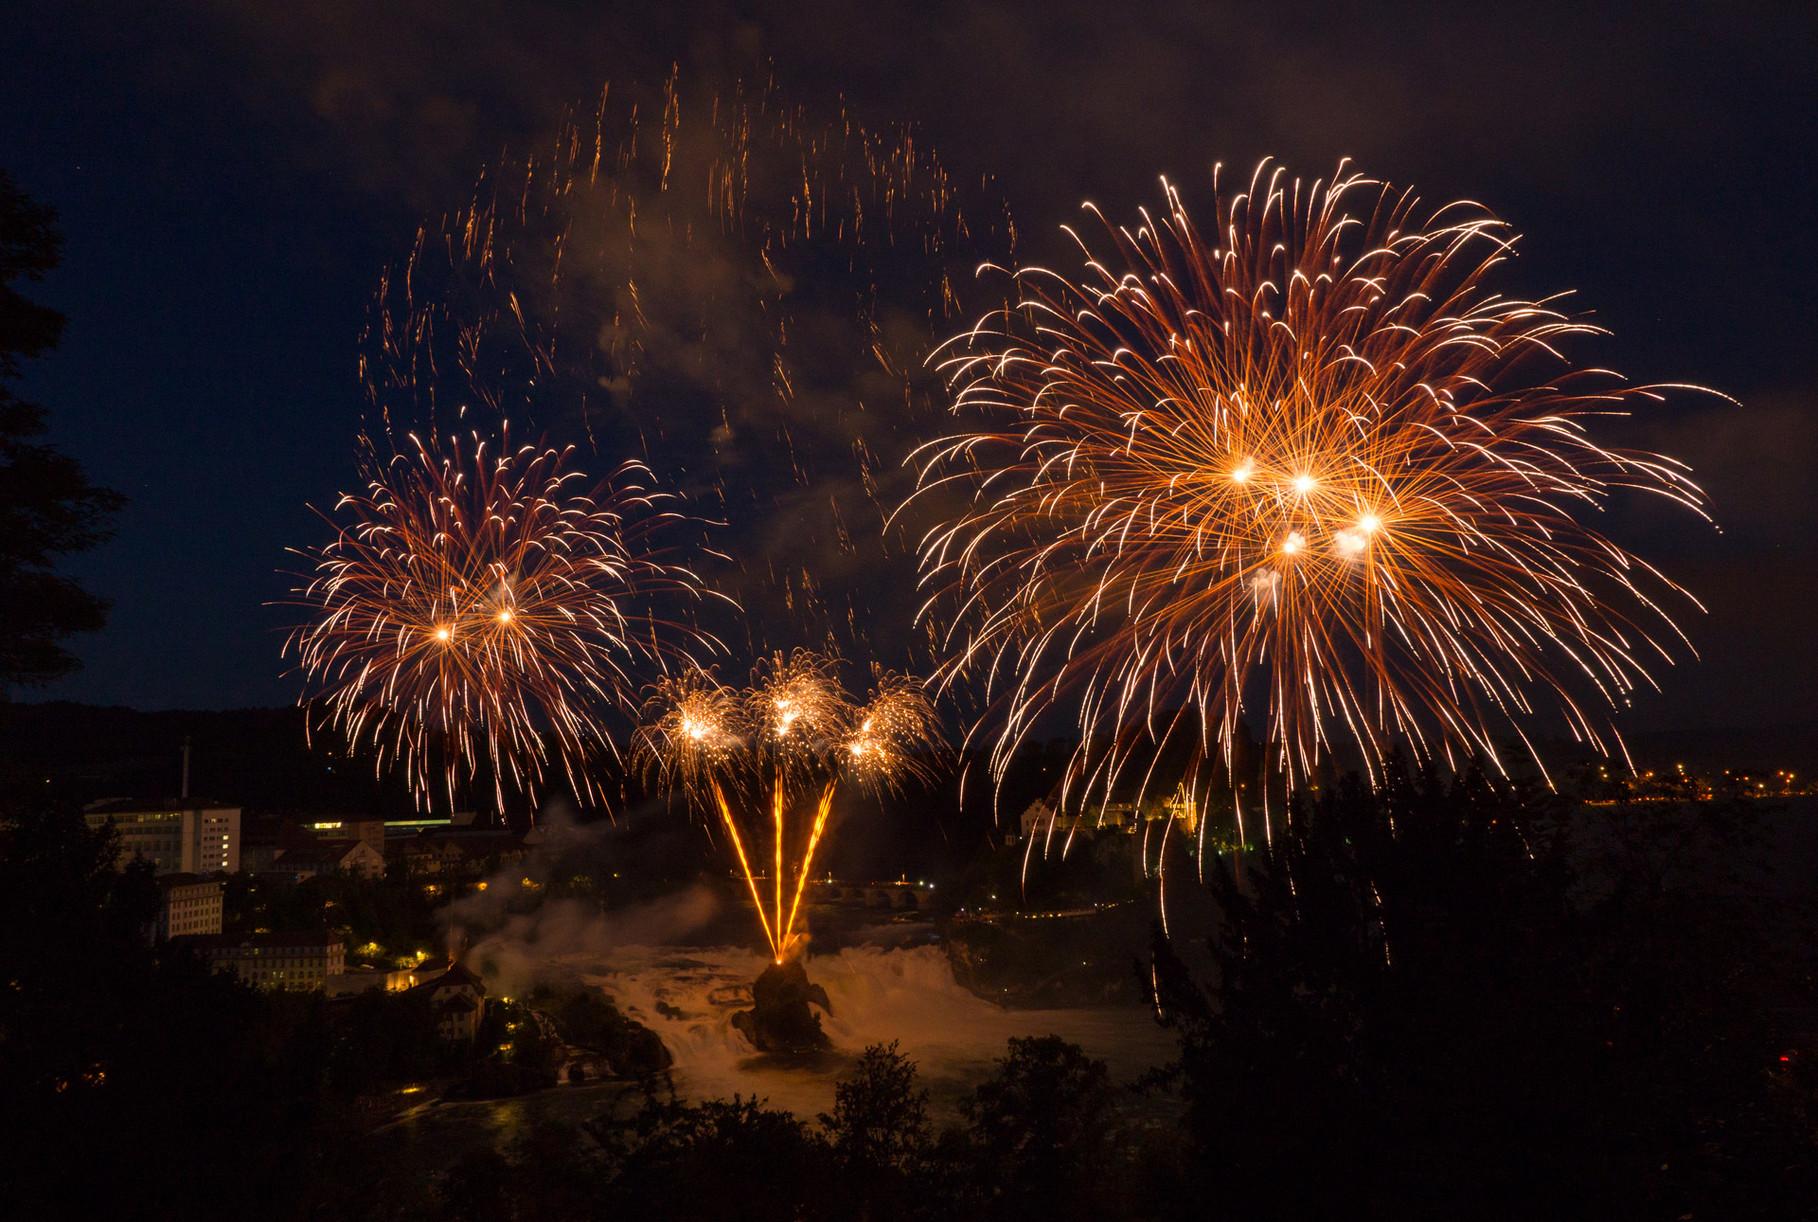 Rheinfall firework